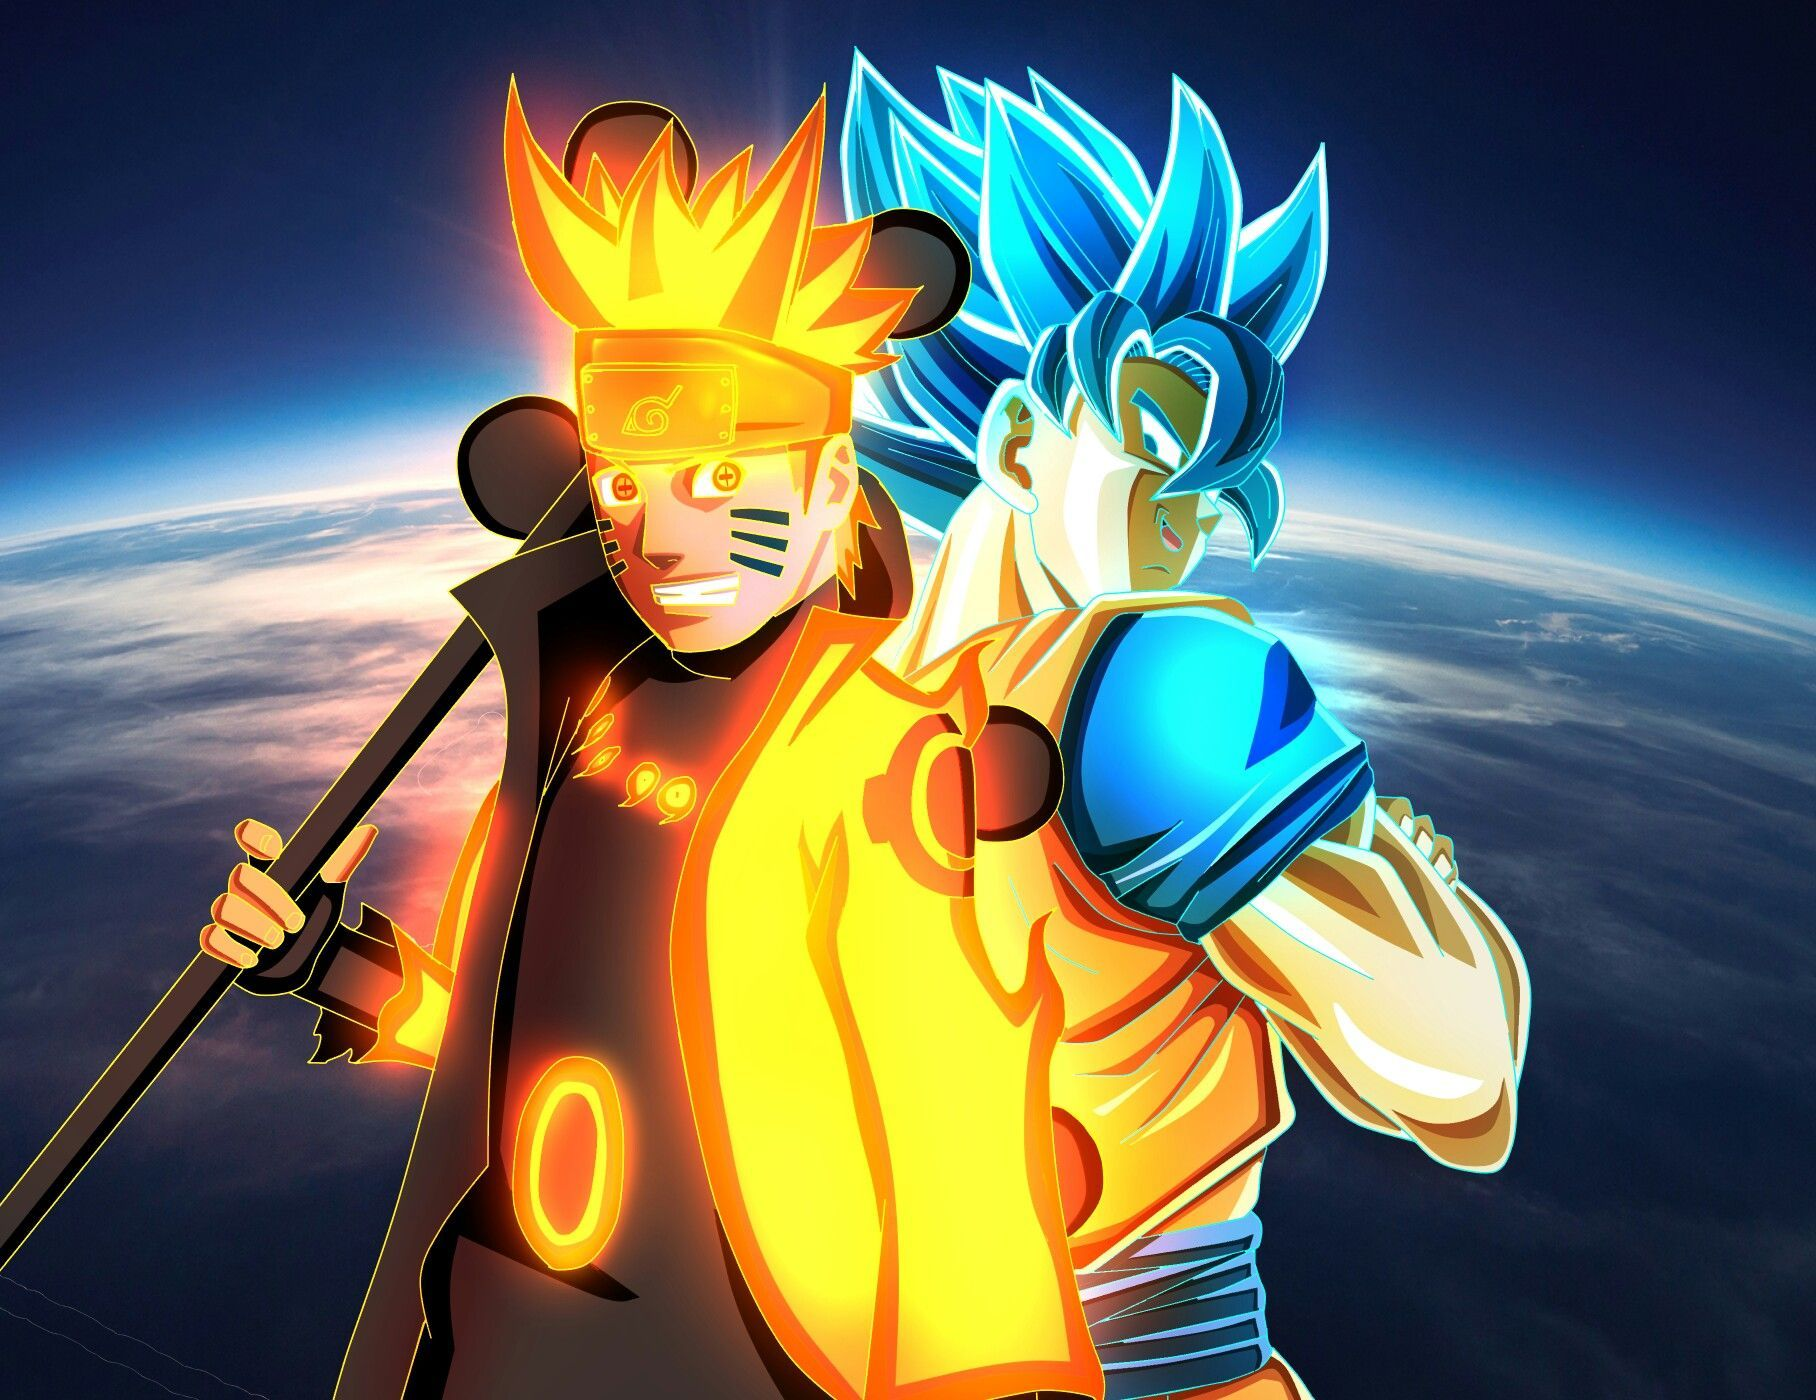 Naruto And Goku Wallpapers Top Free Naruto And Goku Backgrounds Wallpaperaccess